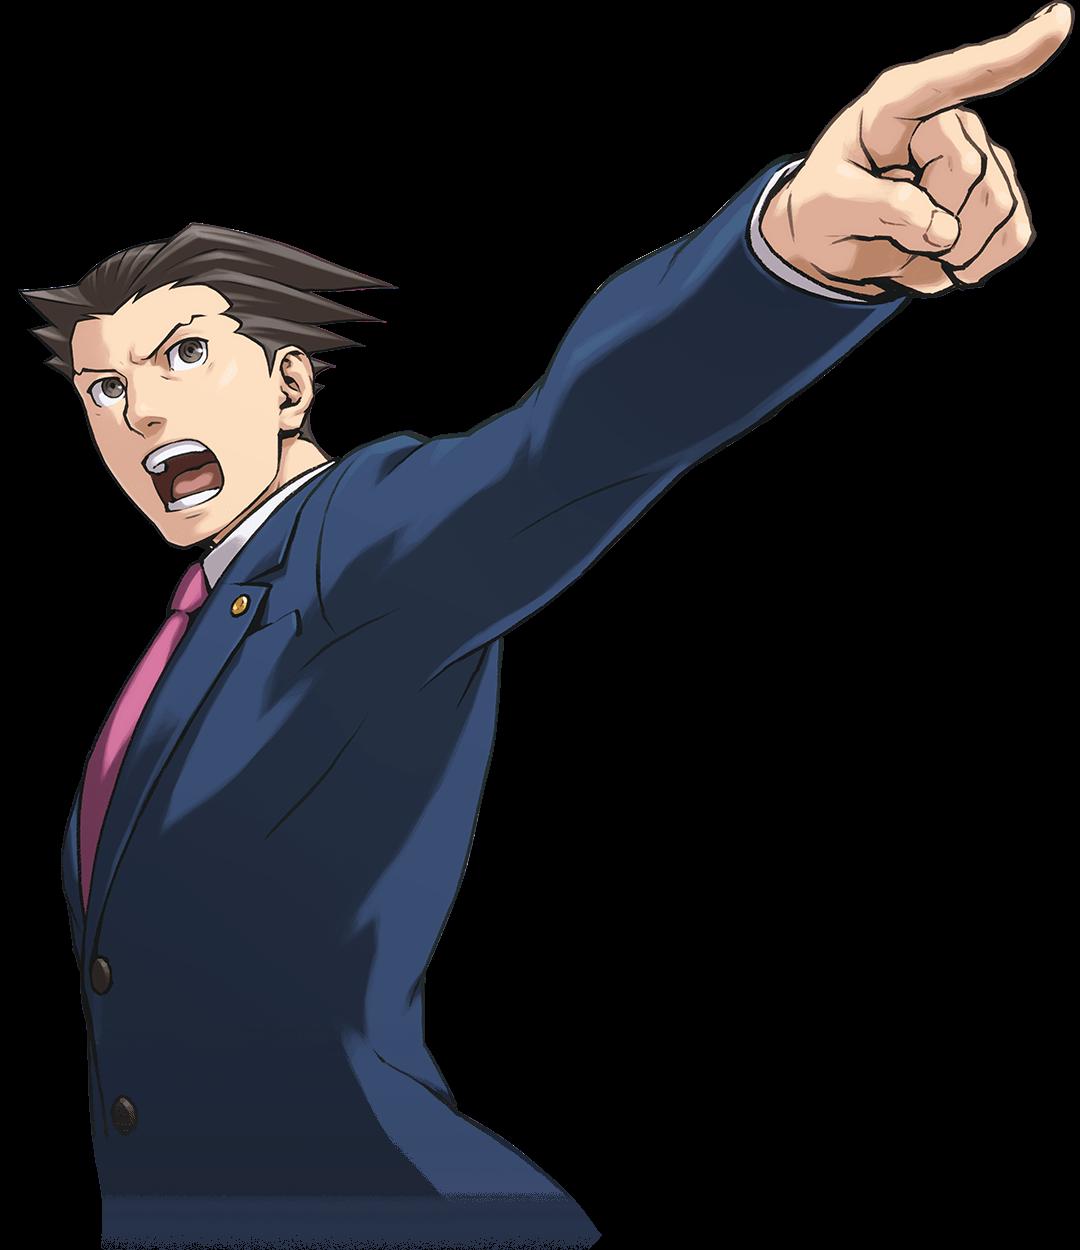 Capcom Phoenix Wright Ace Attorney Trilogy Official Website